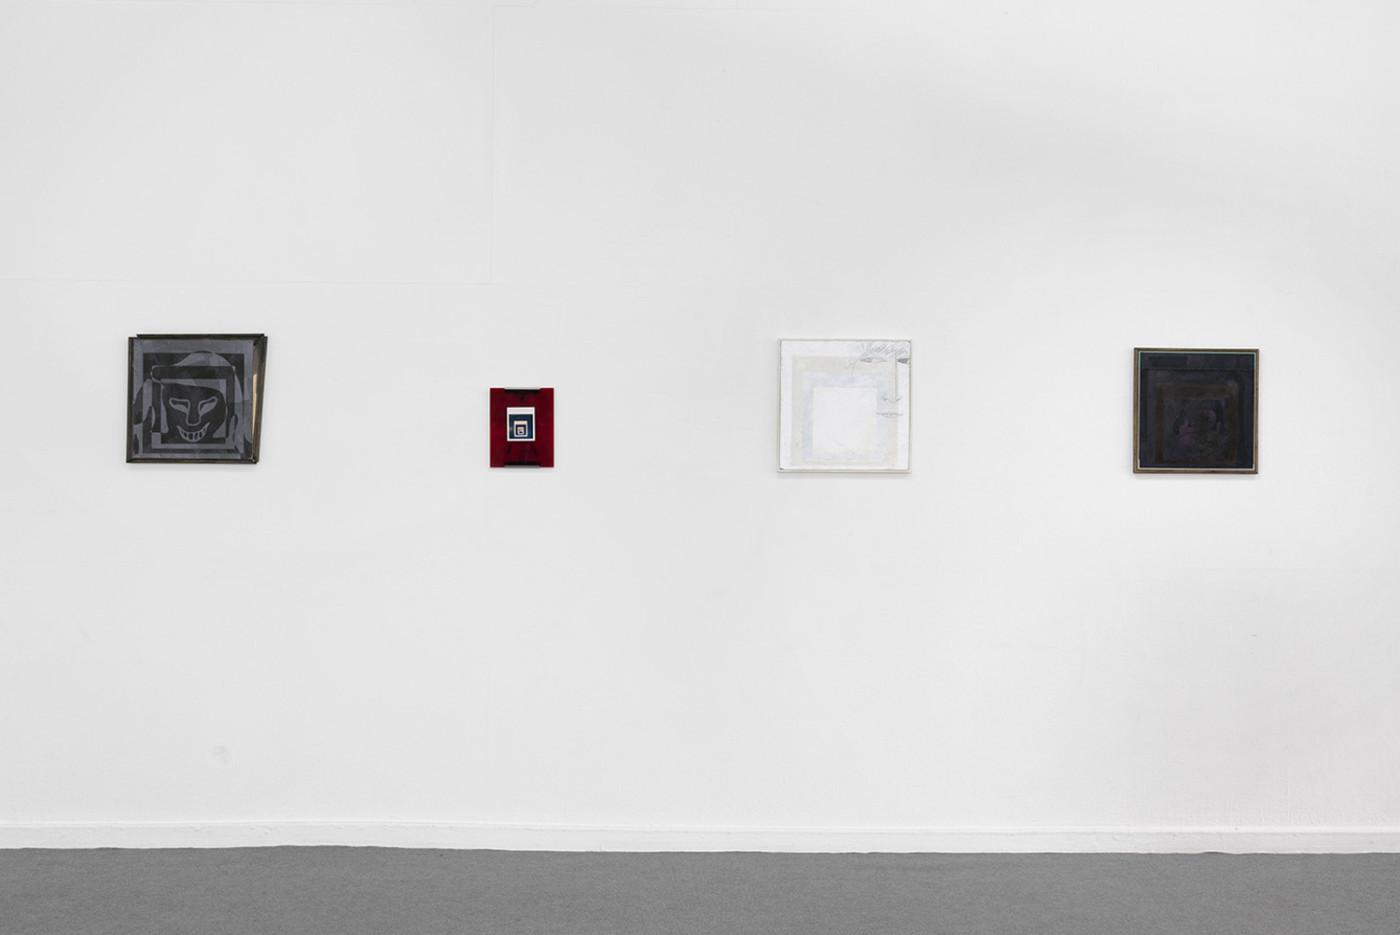 BRADLEY KRONZ  Long Hallway , 2018, Forde, Geneva, installation view - High Art Gallery Paris